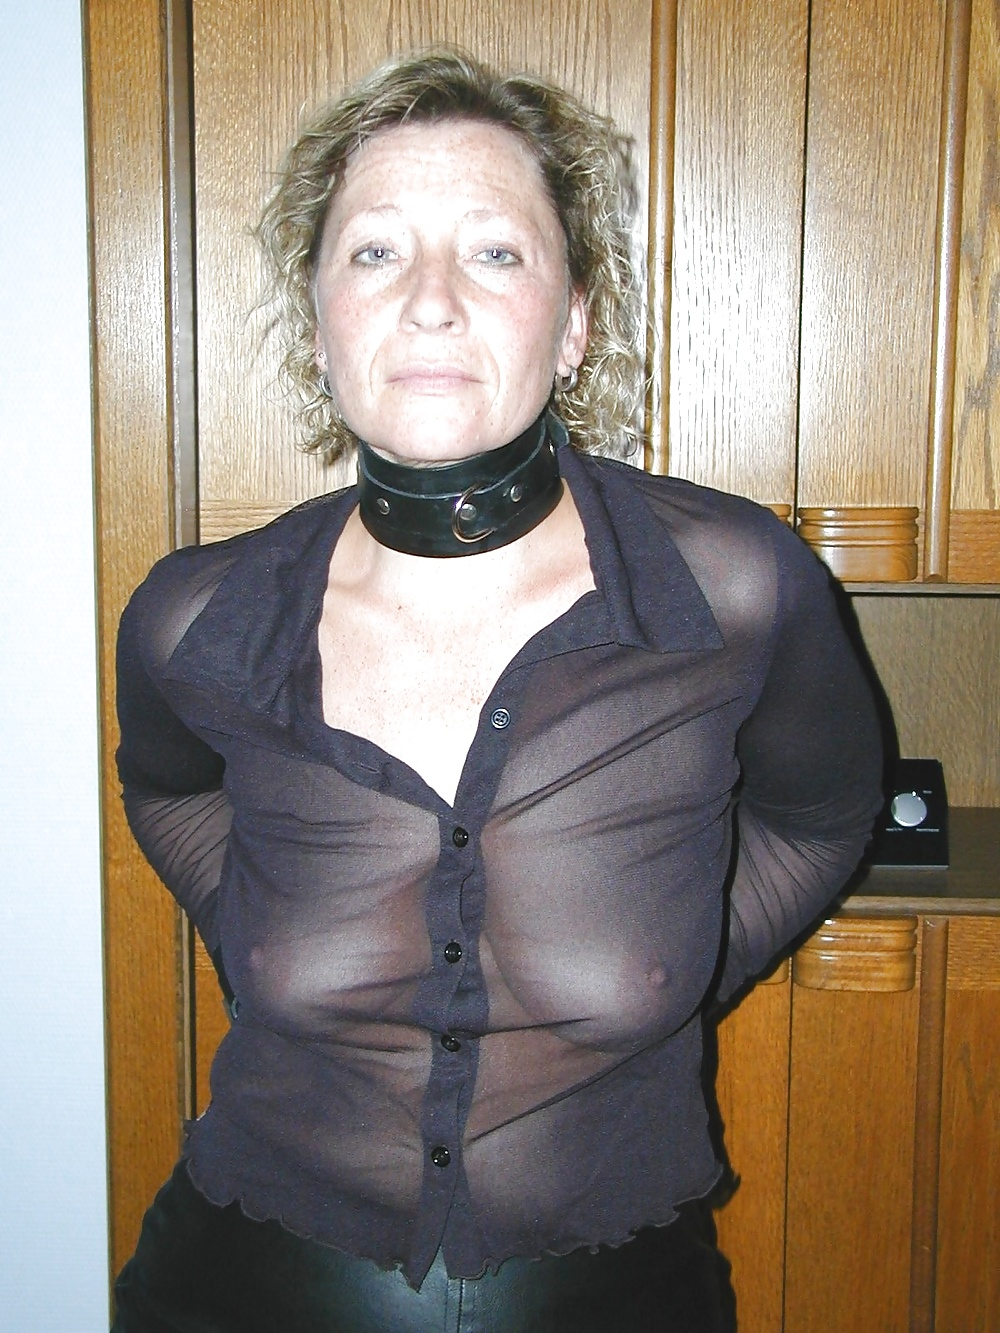 Dreckfotze Granny Sucking: